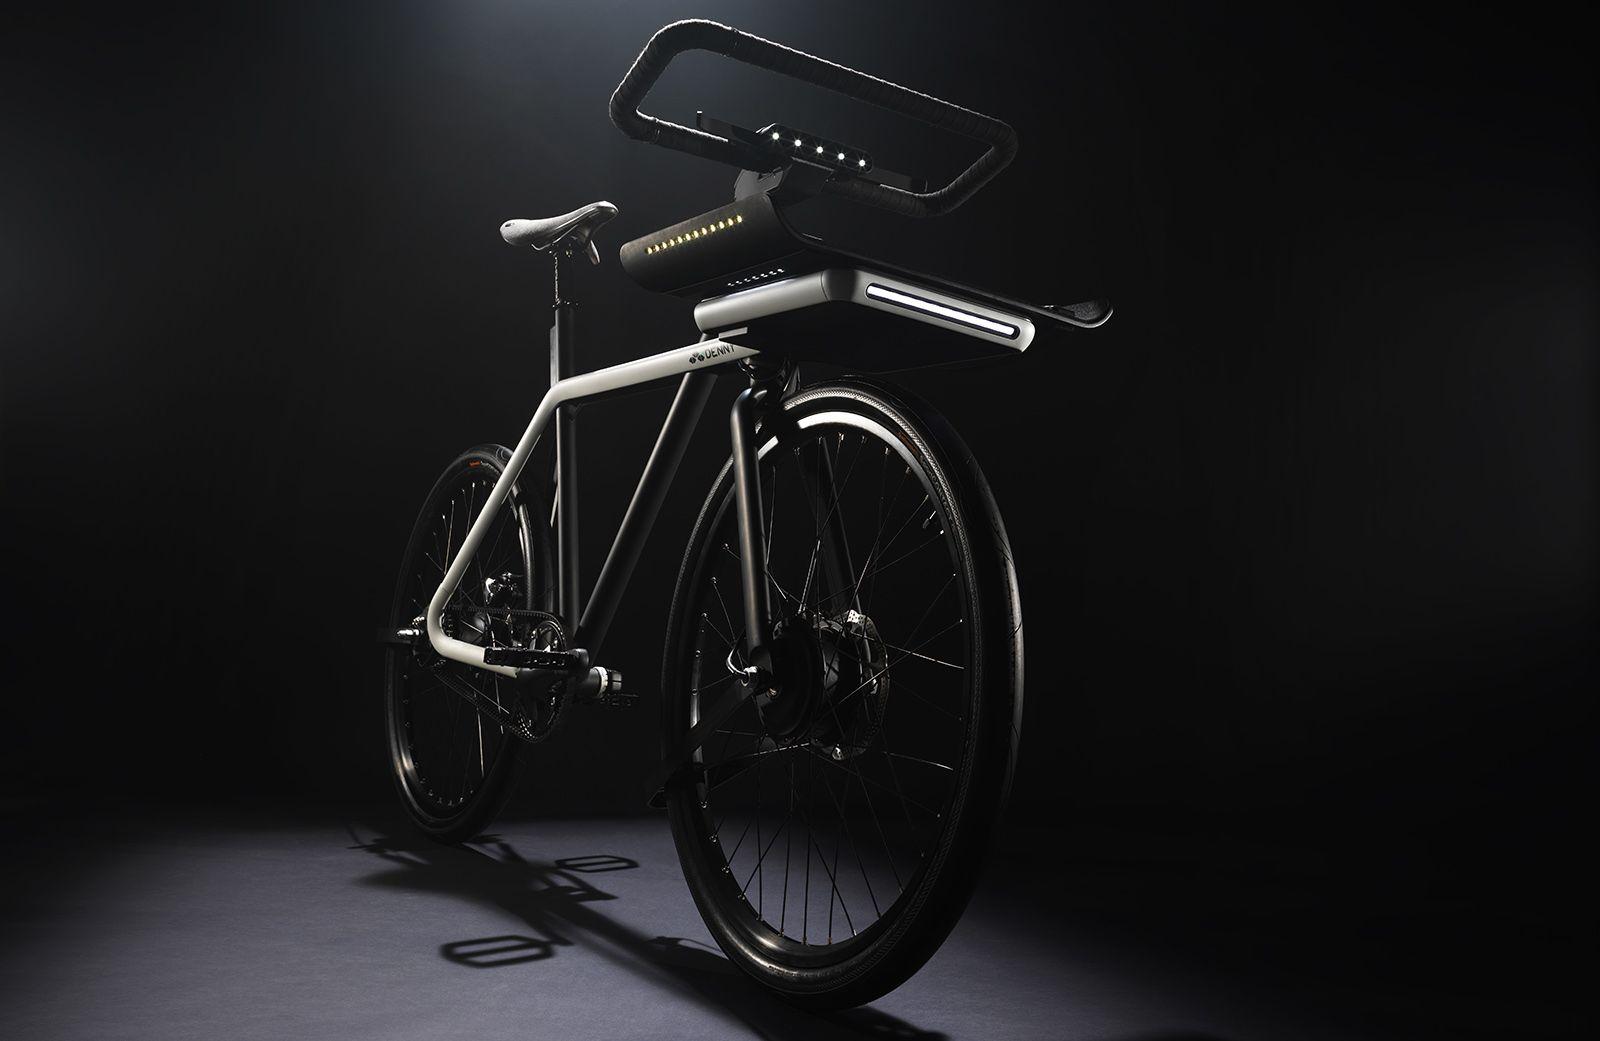 DENNY Bike (With images) Urban bicycle, Urban bike, Bike